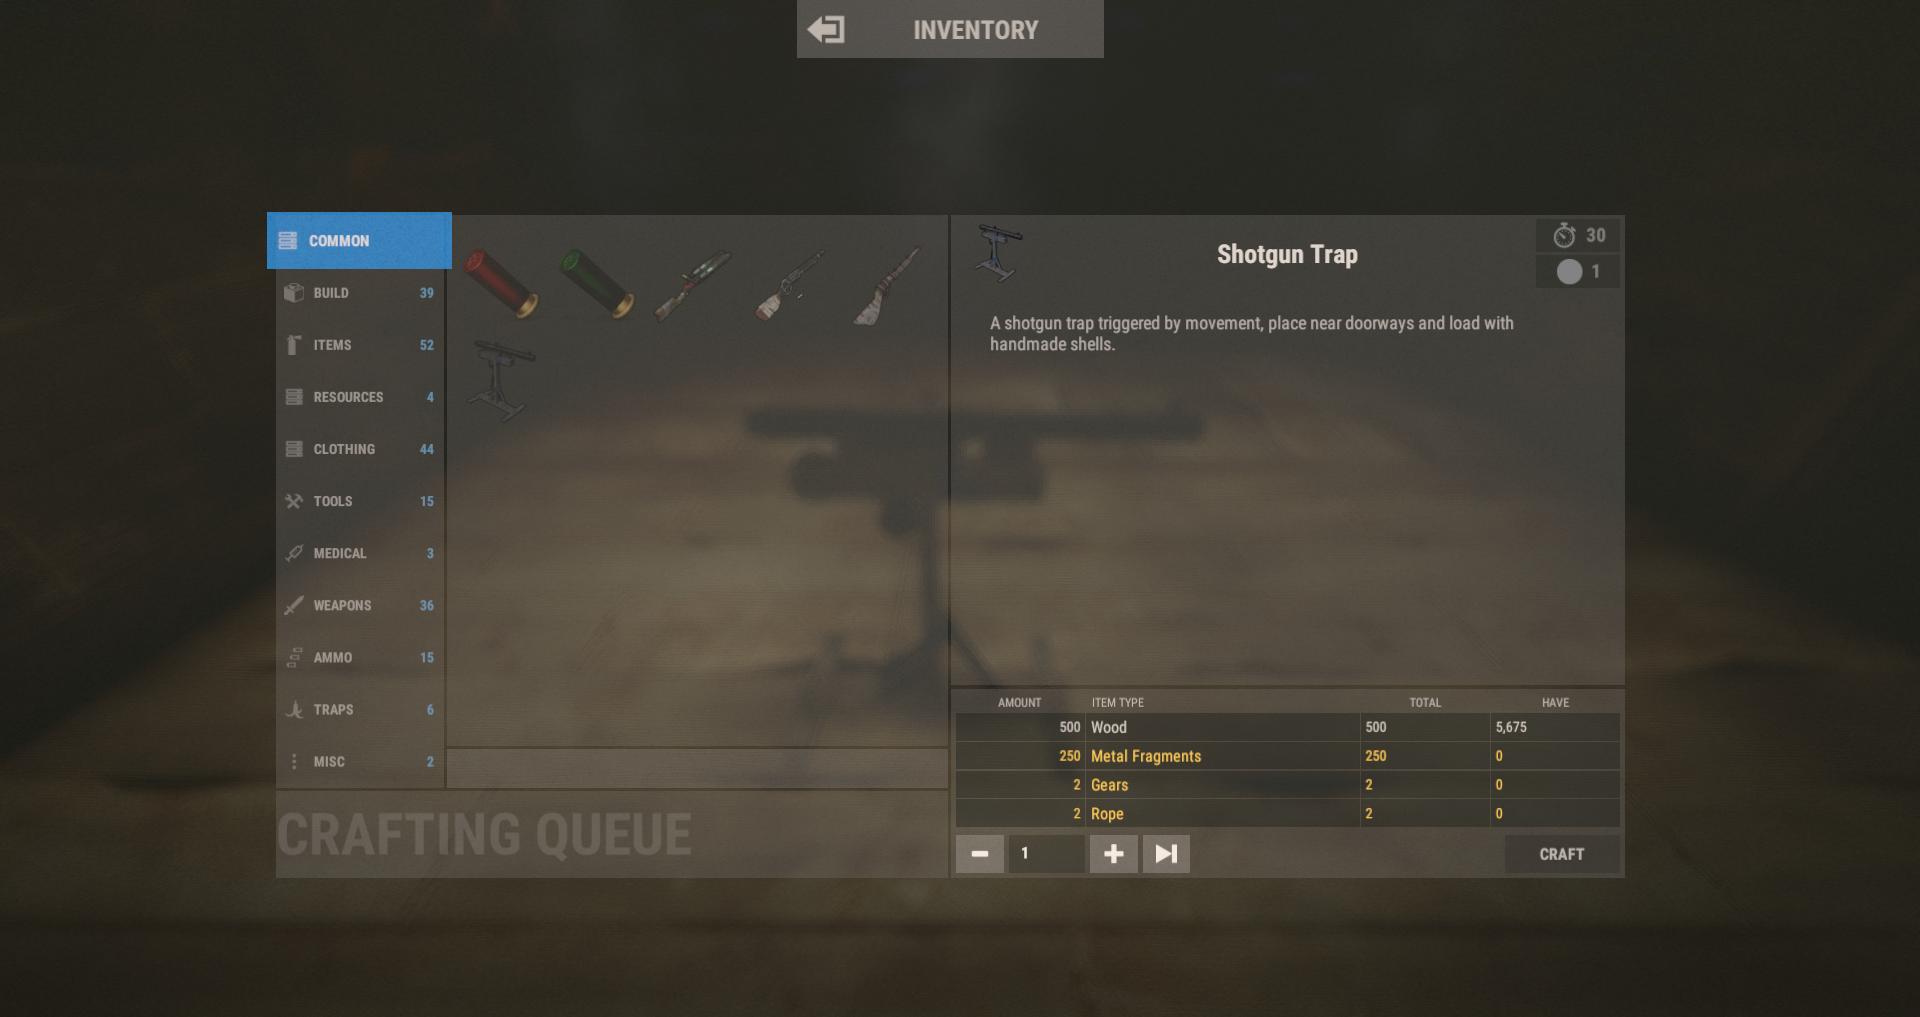 New Shotgun Trap Costs